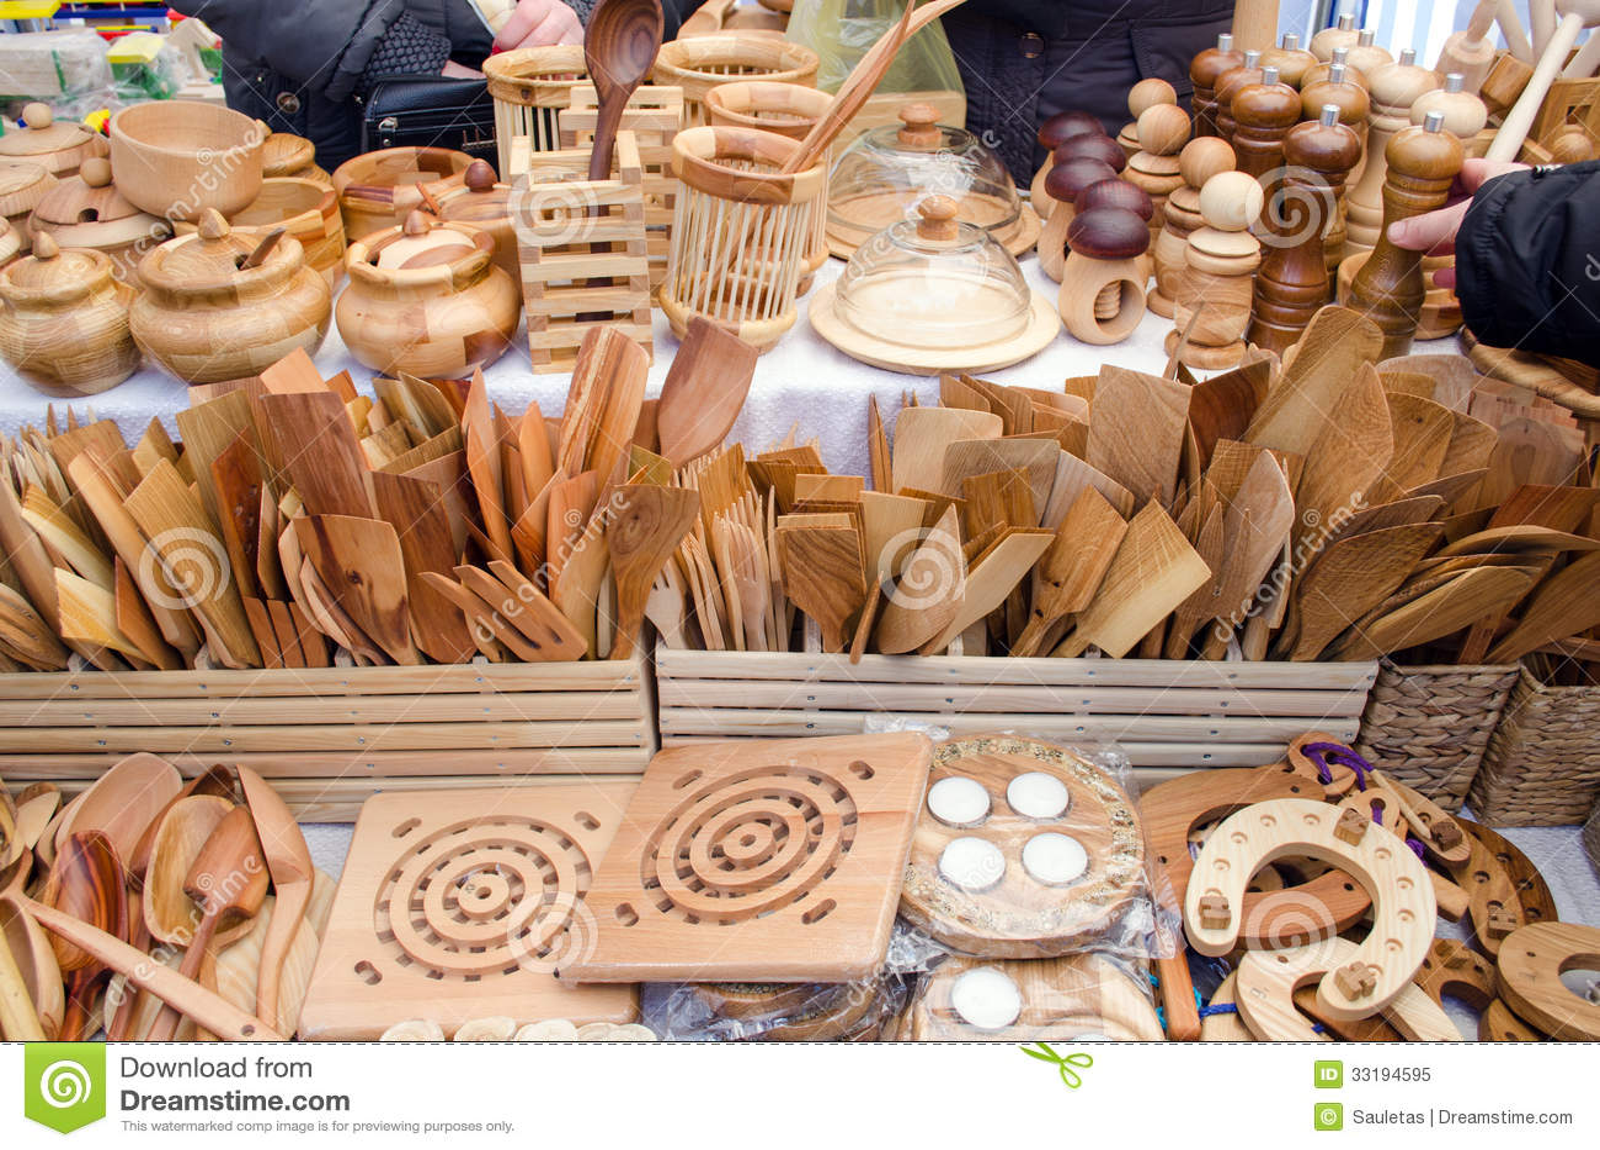 handmade wooden kitchen utensil tools bazaar fair stock image